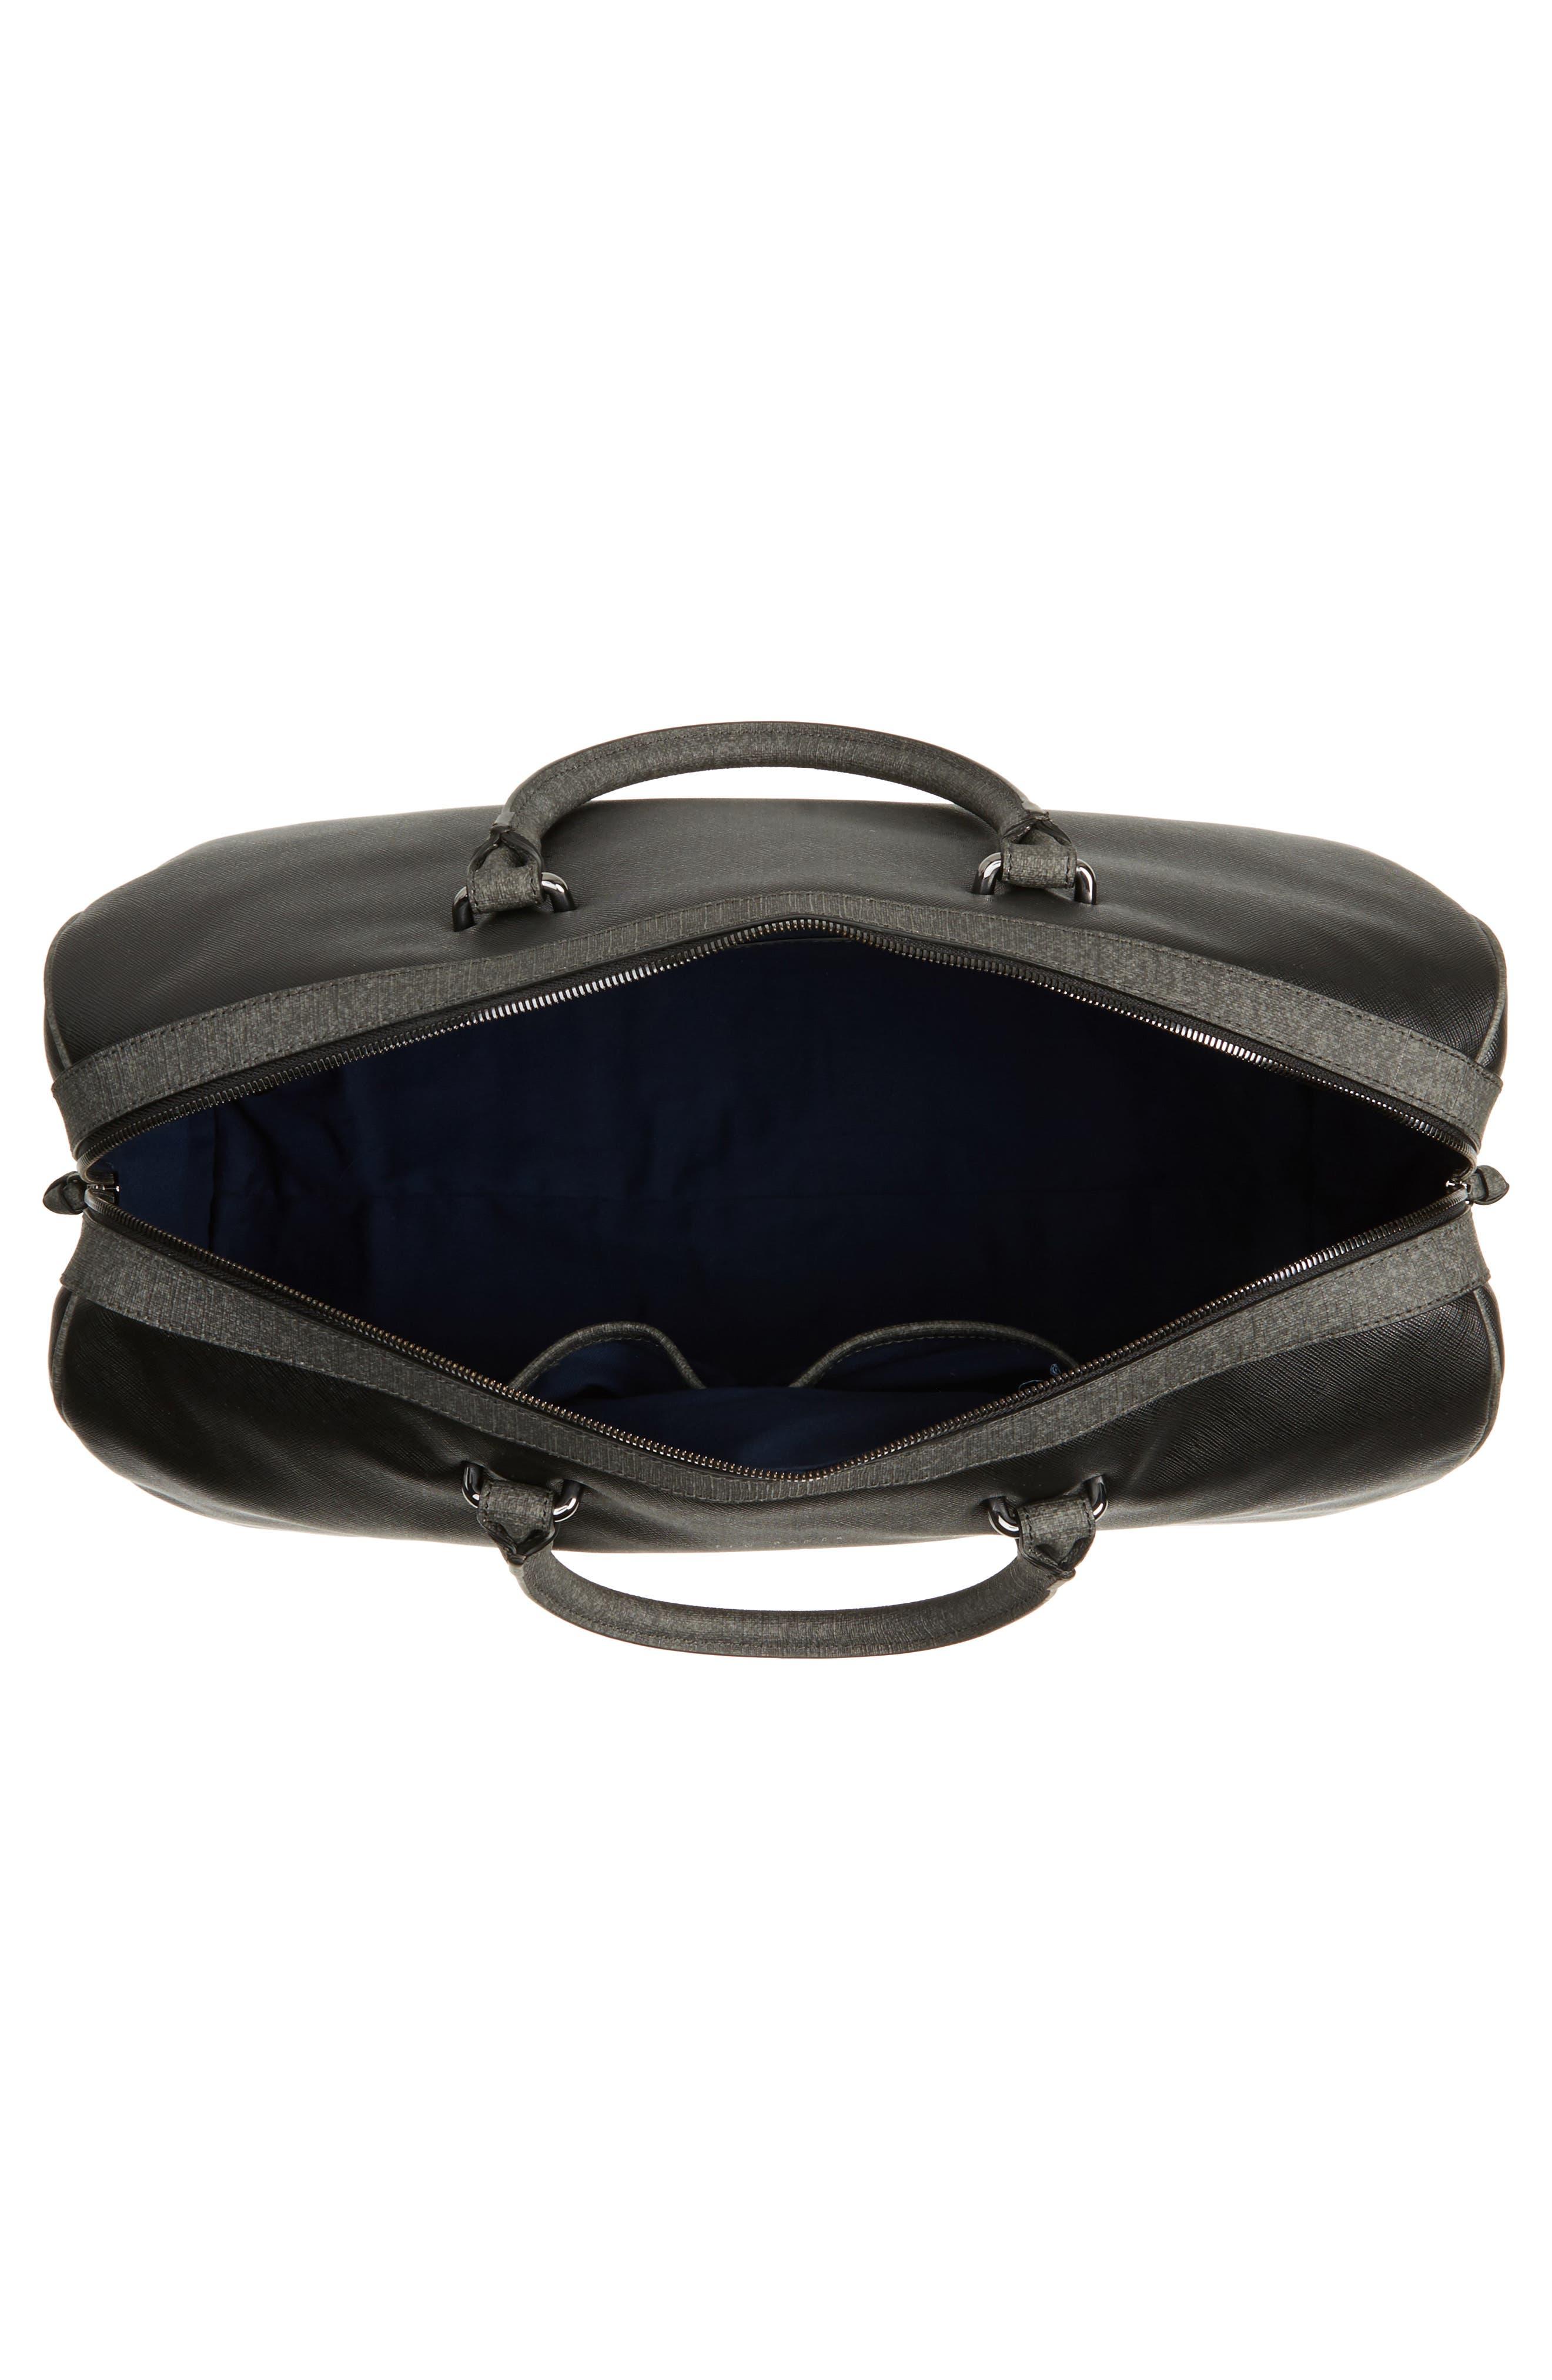 Claws Duffel Bag,                             Alternate thumbnail 4, color,                             001